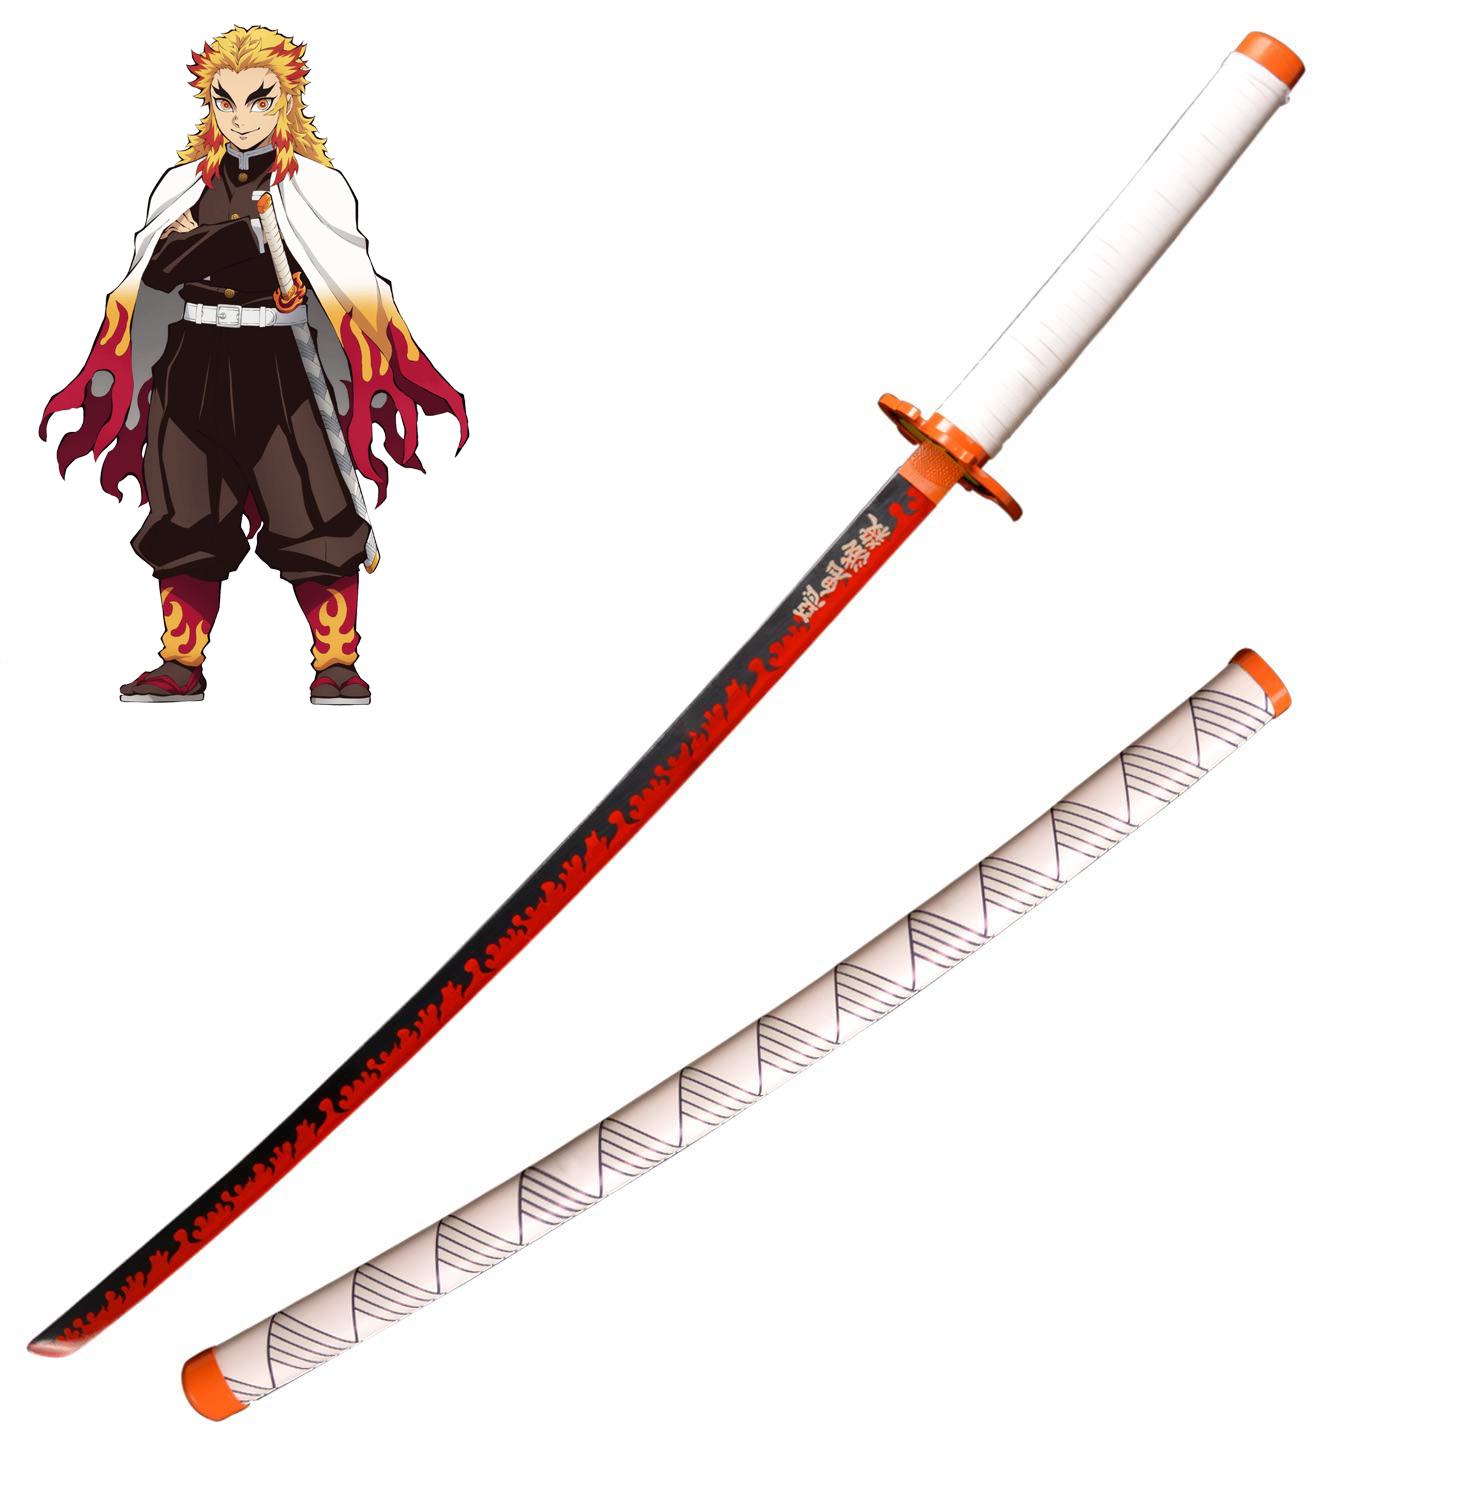 Demon Slayer Handmade Katana Rengoku Kyojuro Steel Sword Kimetsu Yaiba Cosplay